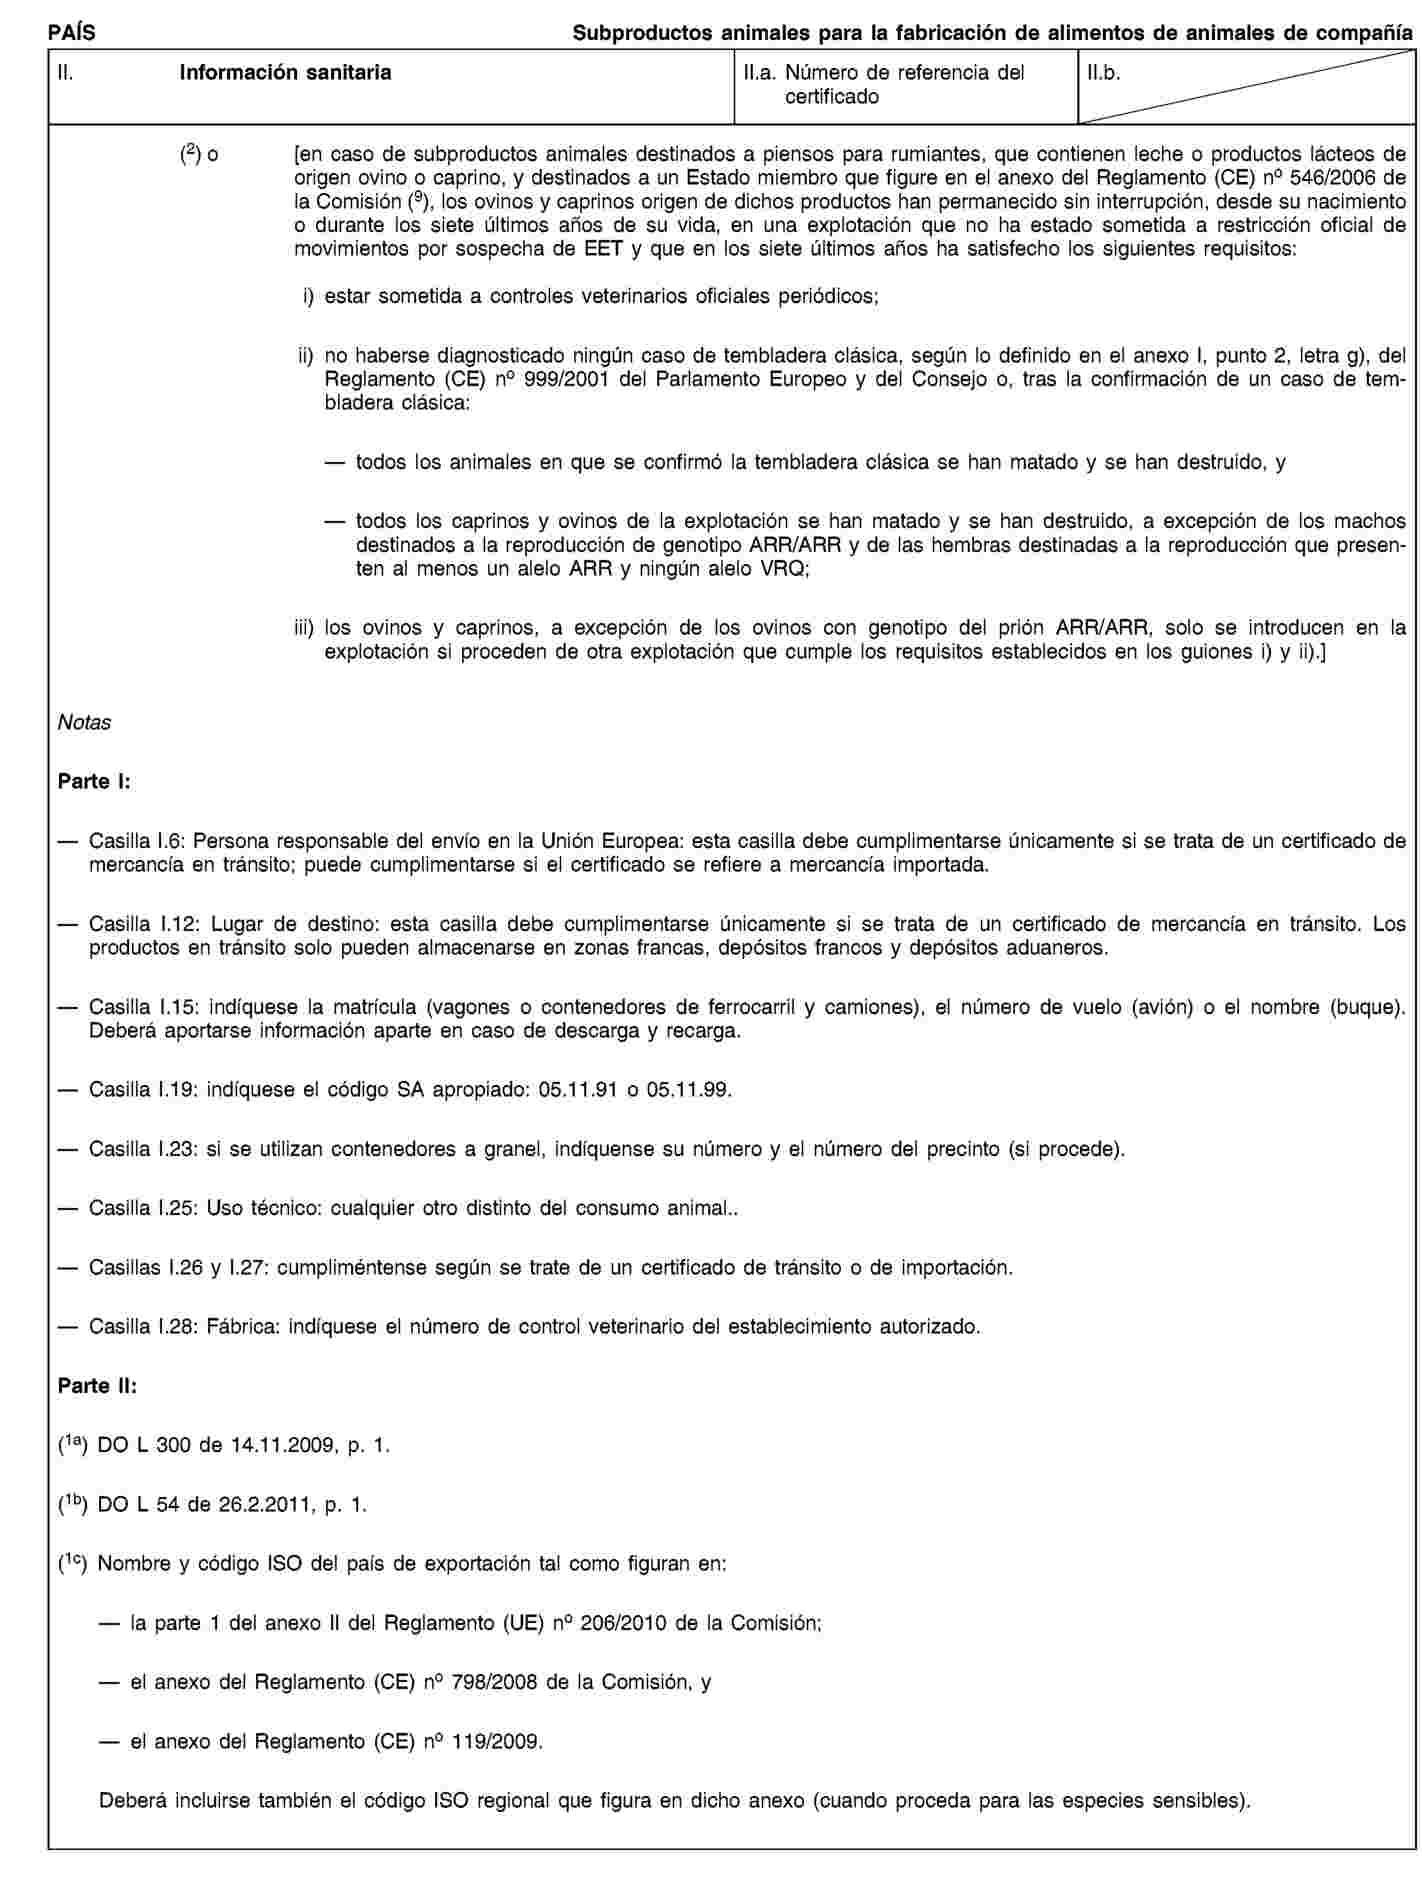 Imagen: https://eur-lex.europa.eu/resource.html?uri=uriserv:OJ.L_.2011.054.01.0001.01.SPA.xhtml.L_2011054ES.01015901.tif.jpg